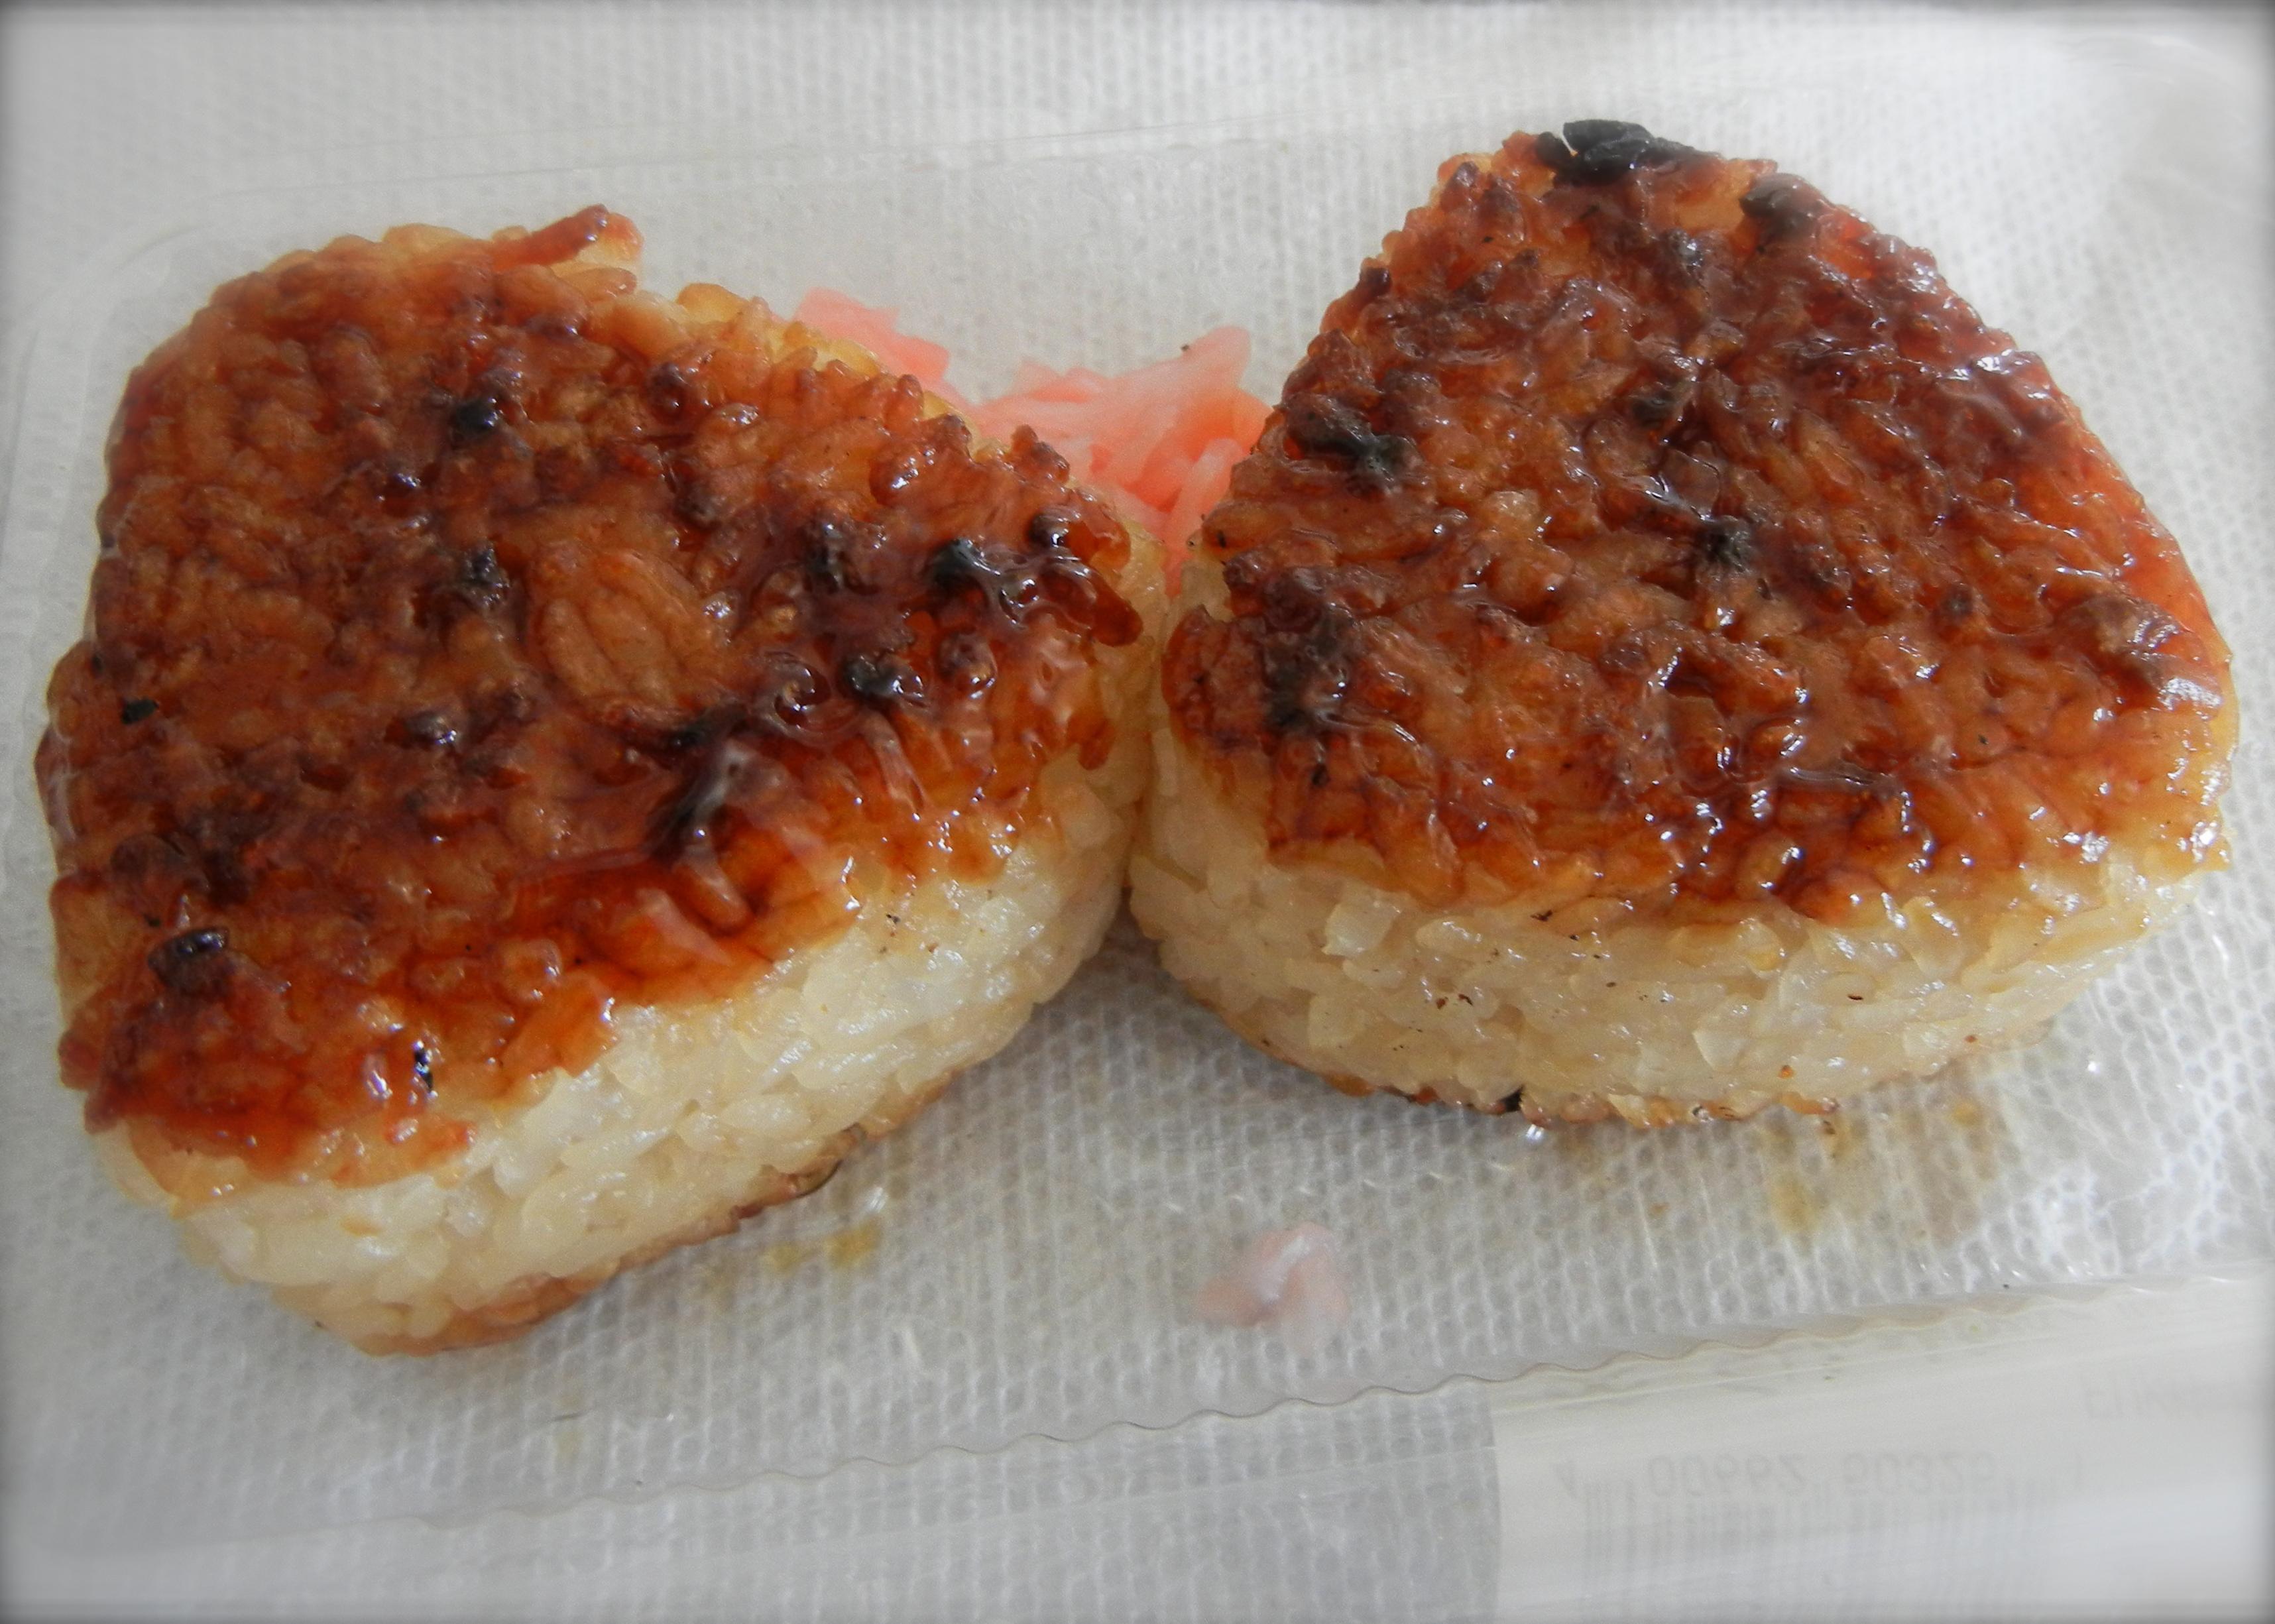 File:Delicious yaki onigiri.jpg - Wikimedia Commons